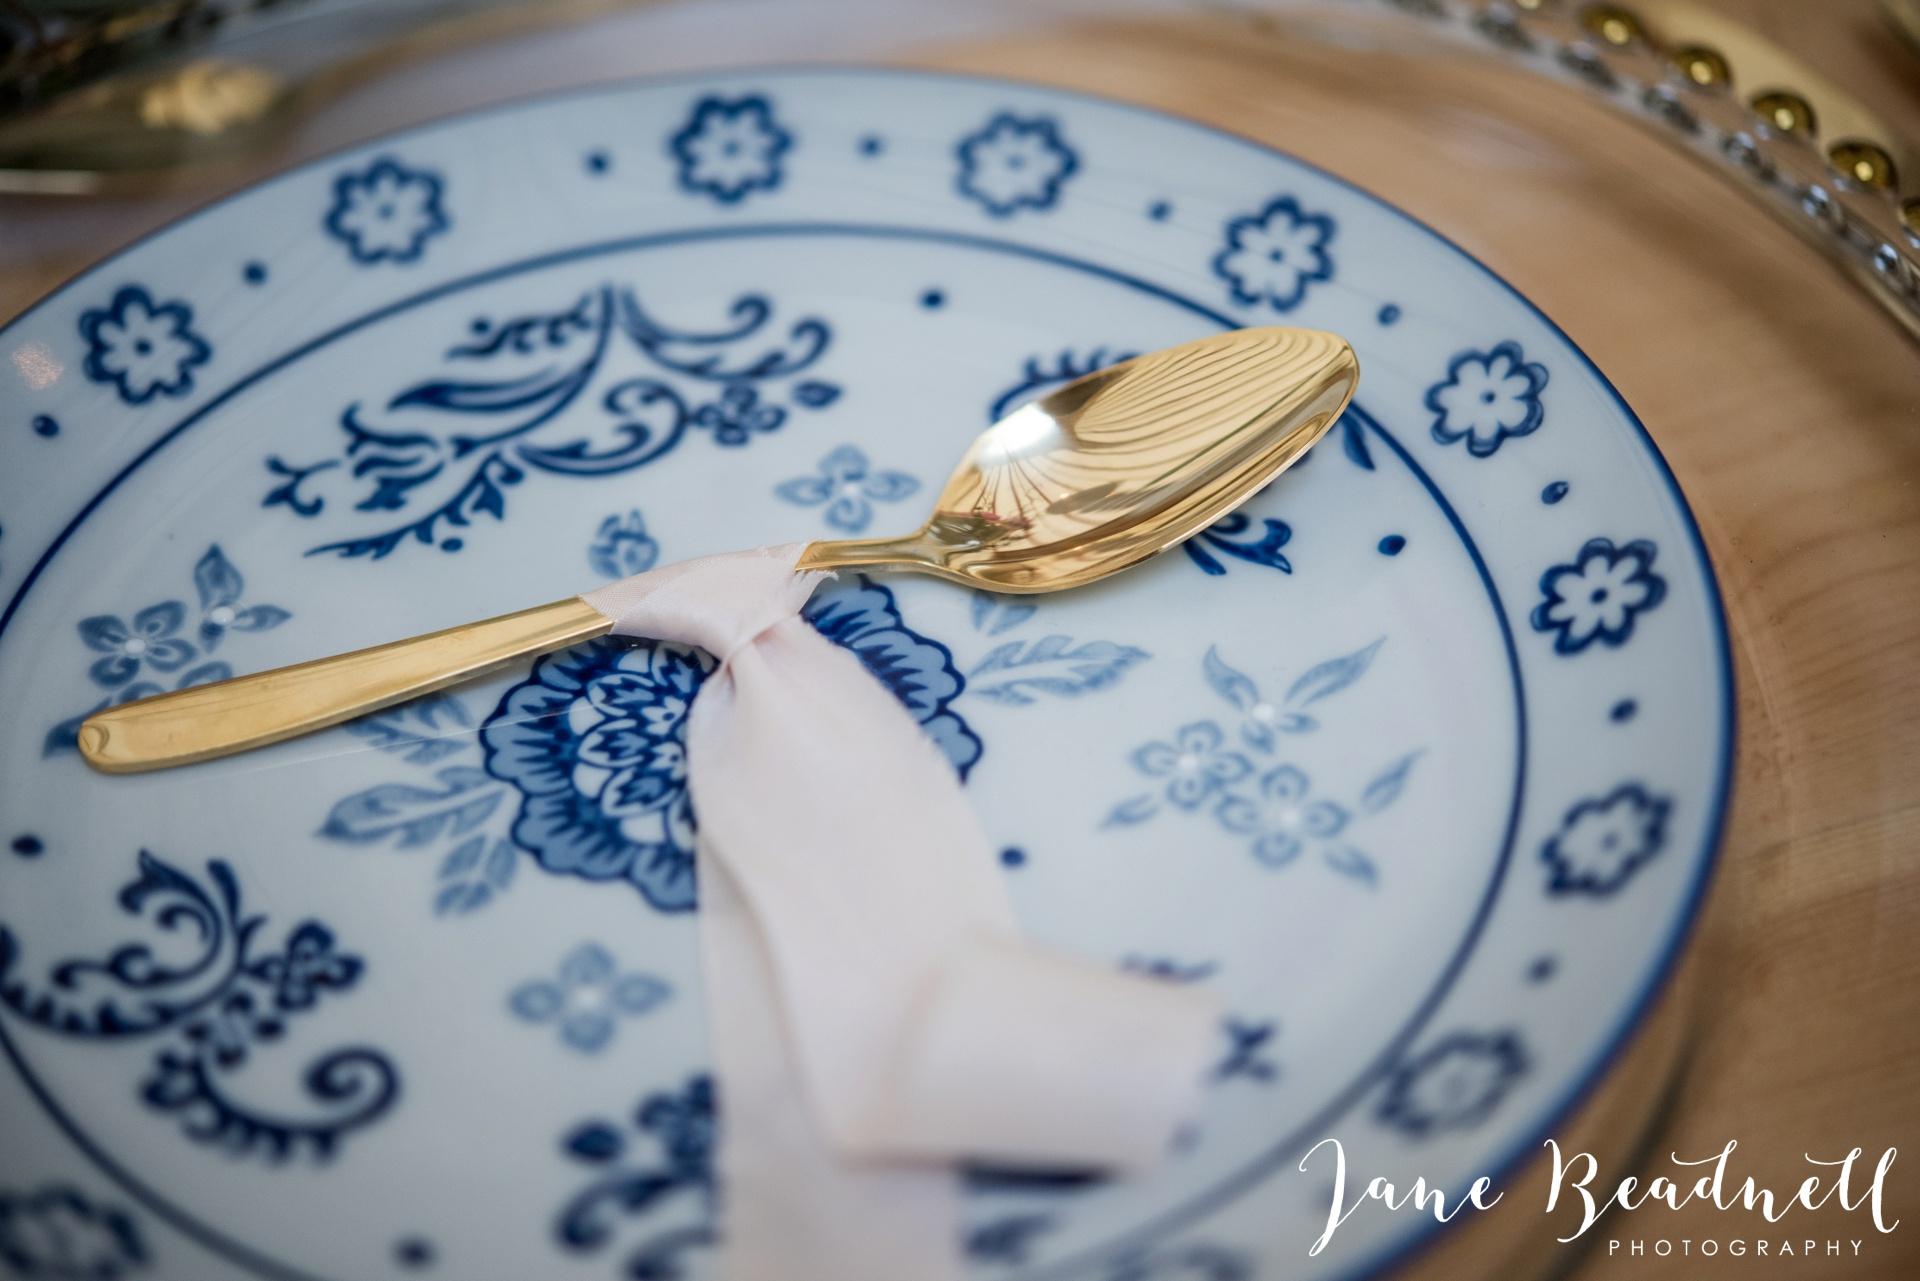 The Bivouac Masham fine art wedding photography jane beadnell photography_0011